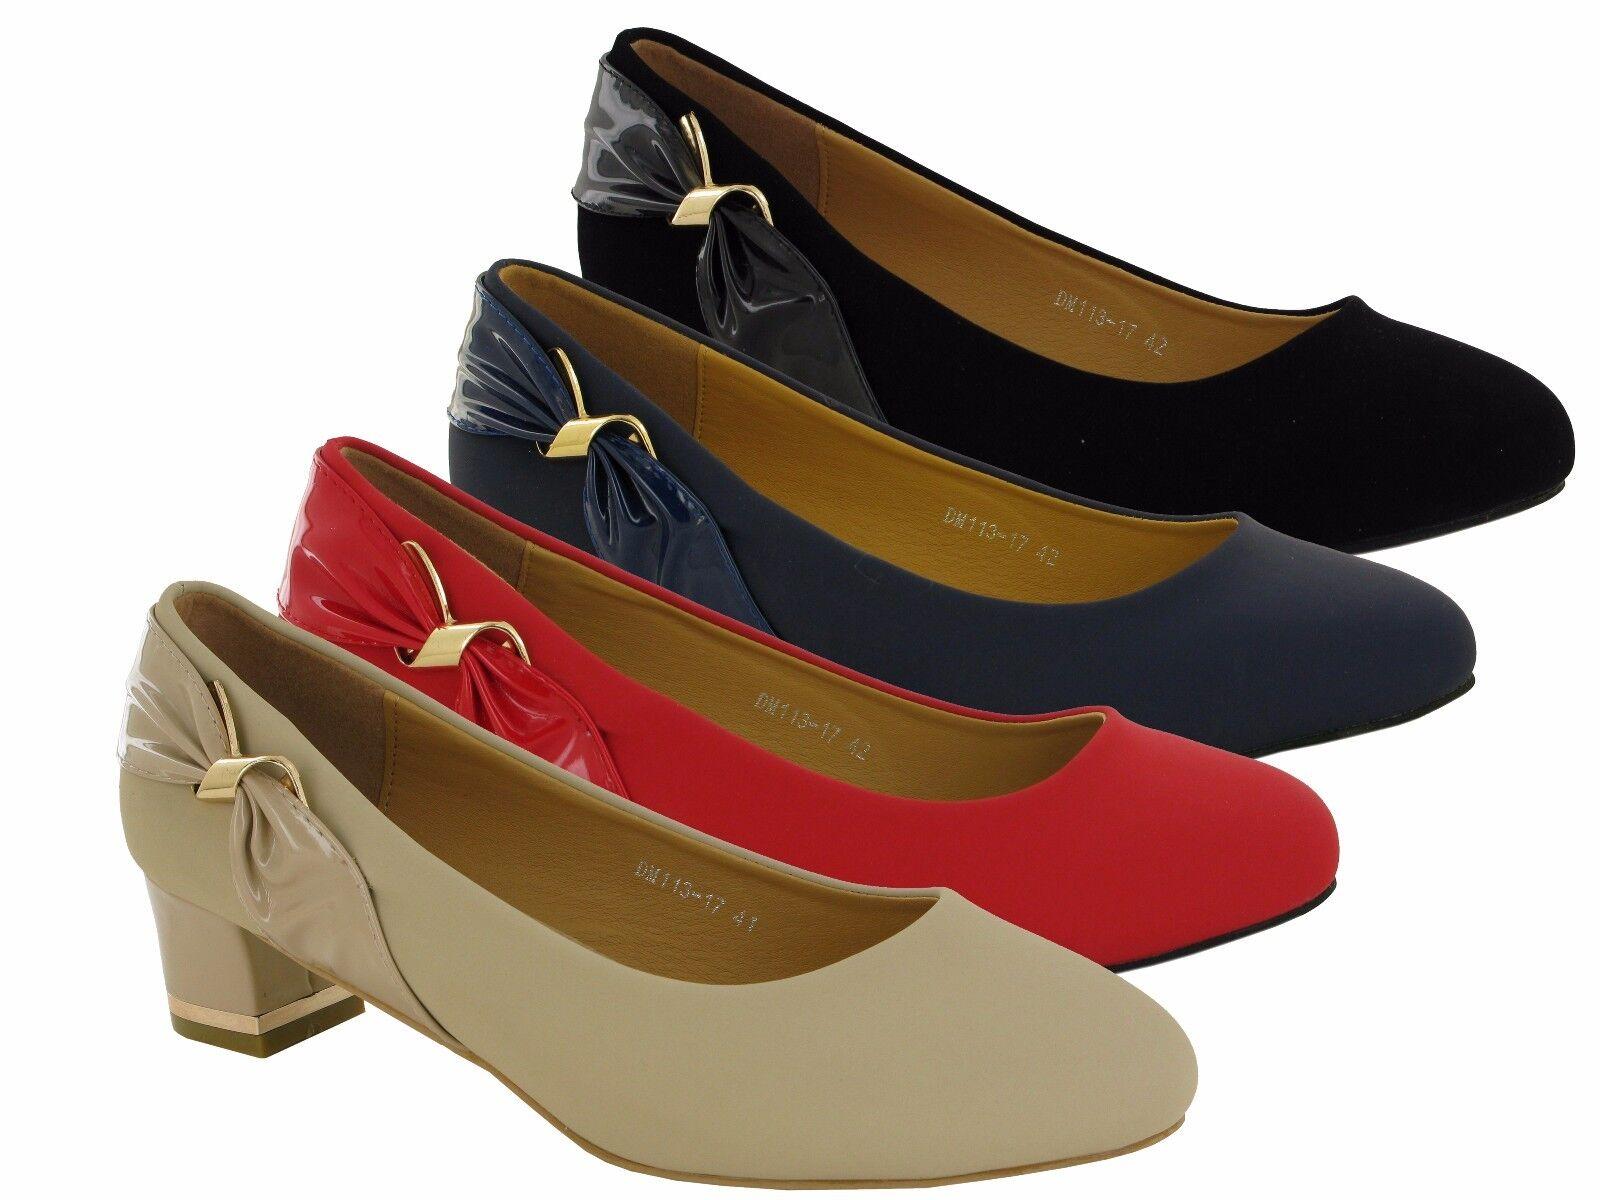 New Ladies/Womens Block Heel 8-11 Court Shoes,Black,Red,Navy UK SIZES 8-11 Heel 71bdde